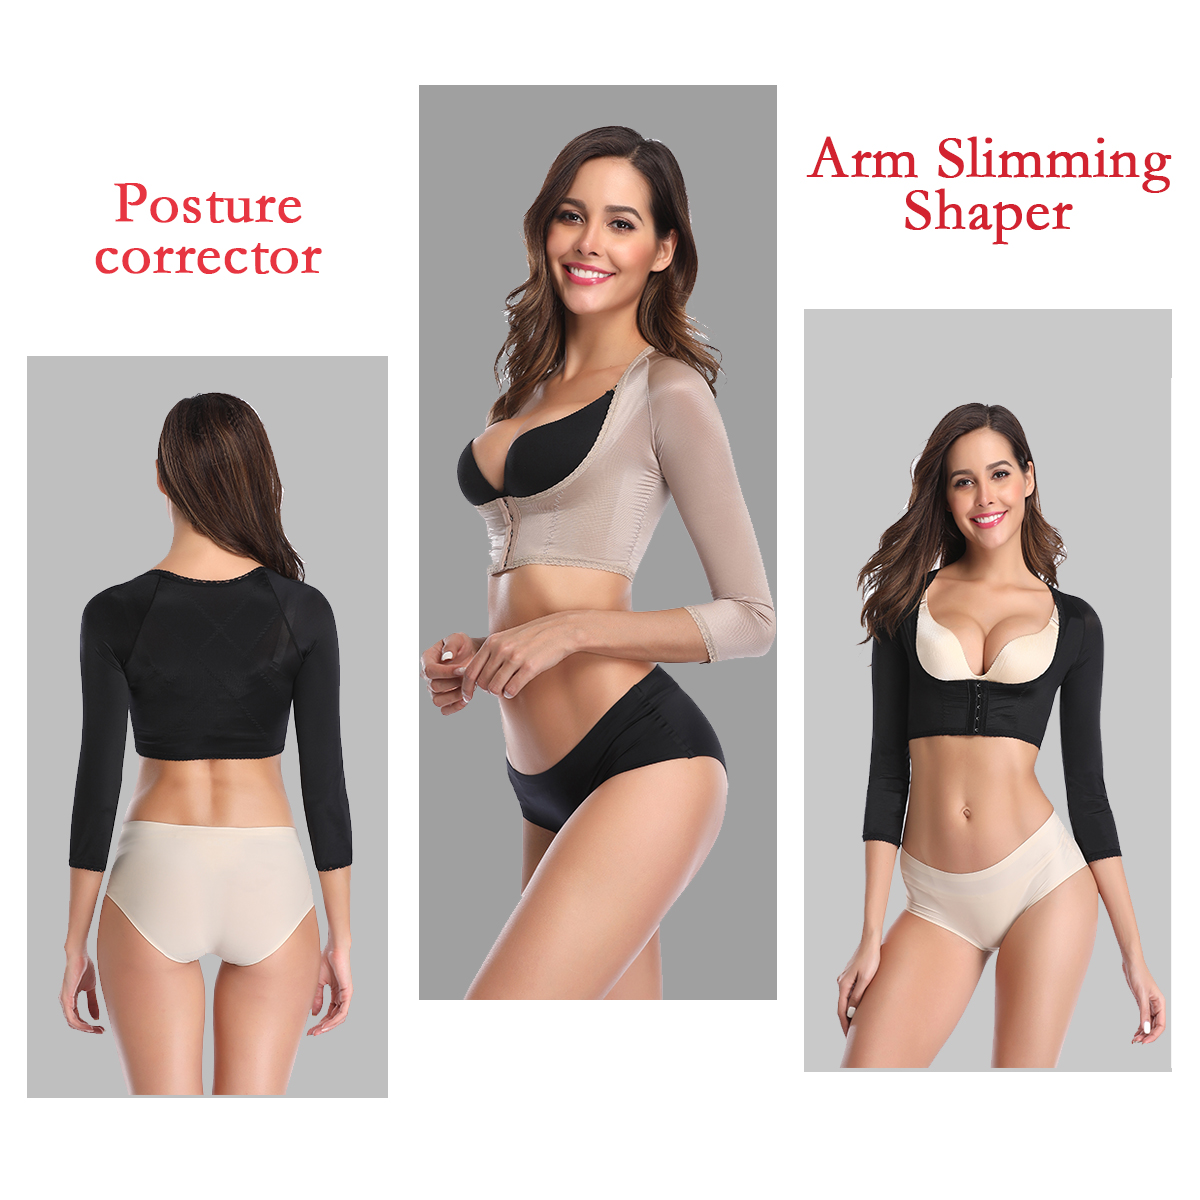 Humpback Posture Corrector Arm Shapers For Women Crop Tops Compression Slimming Upper Surgical Slimmer Arm Vest Shapewear